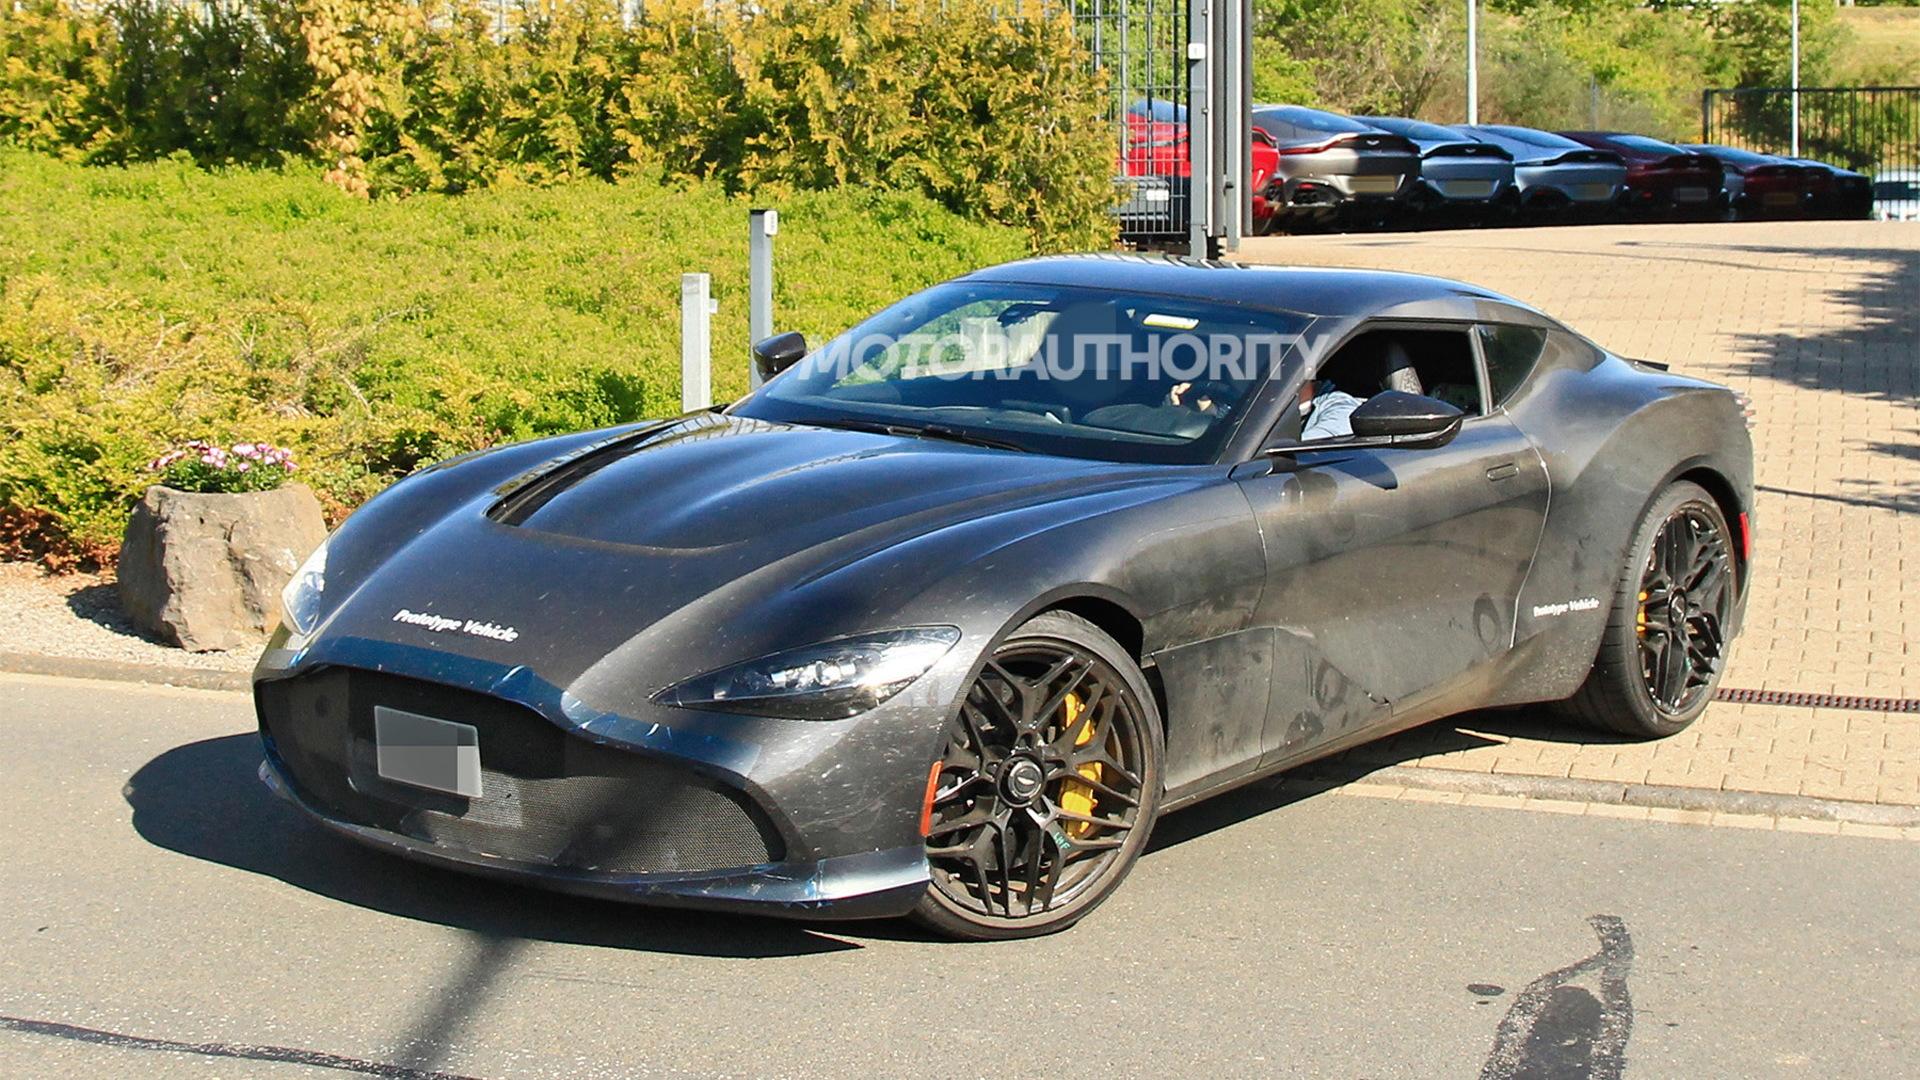 Aston Martin DBS GT Zagato spy shots - Photo credit:S. Baldauf/SB-Medien